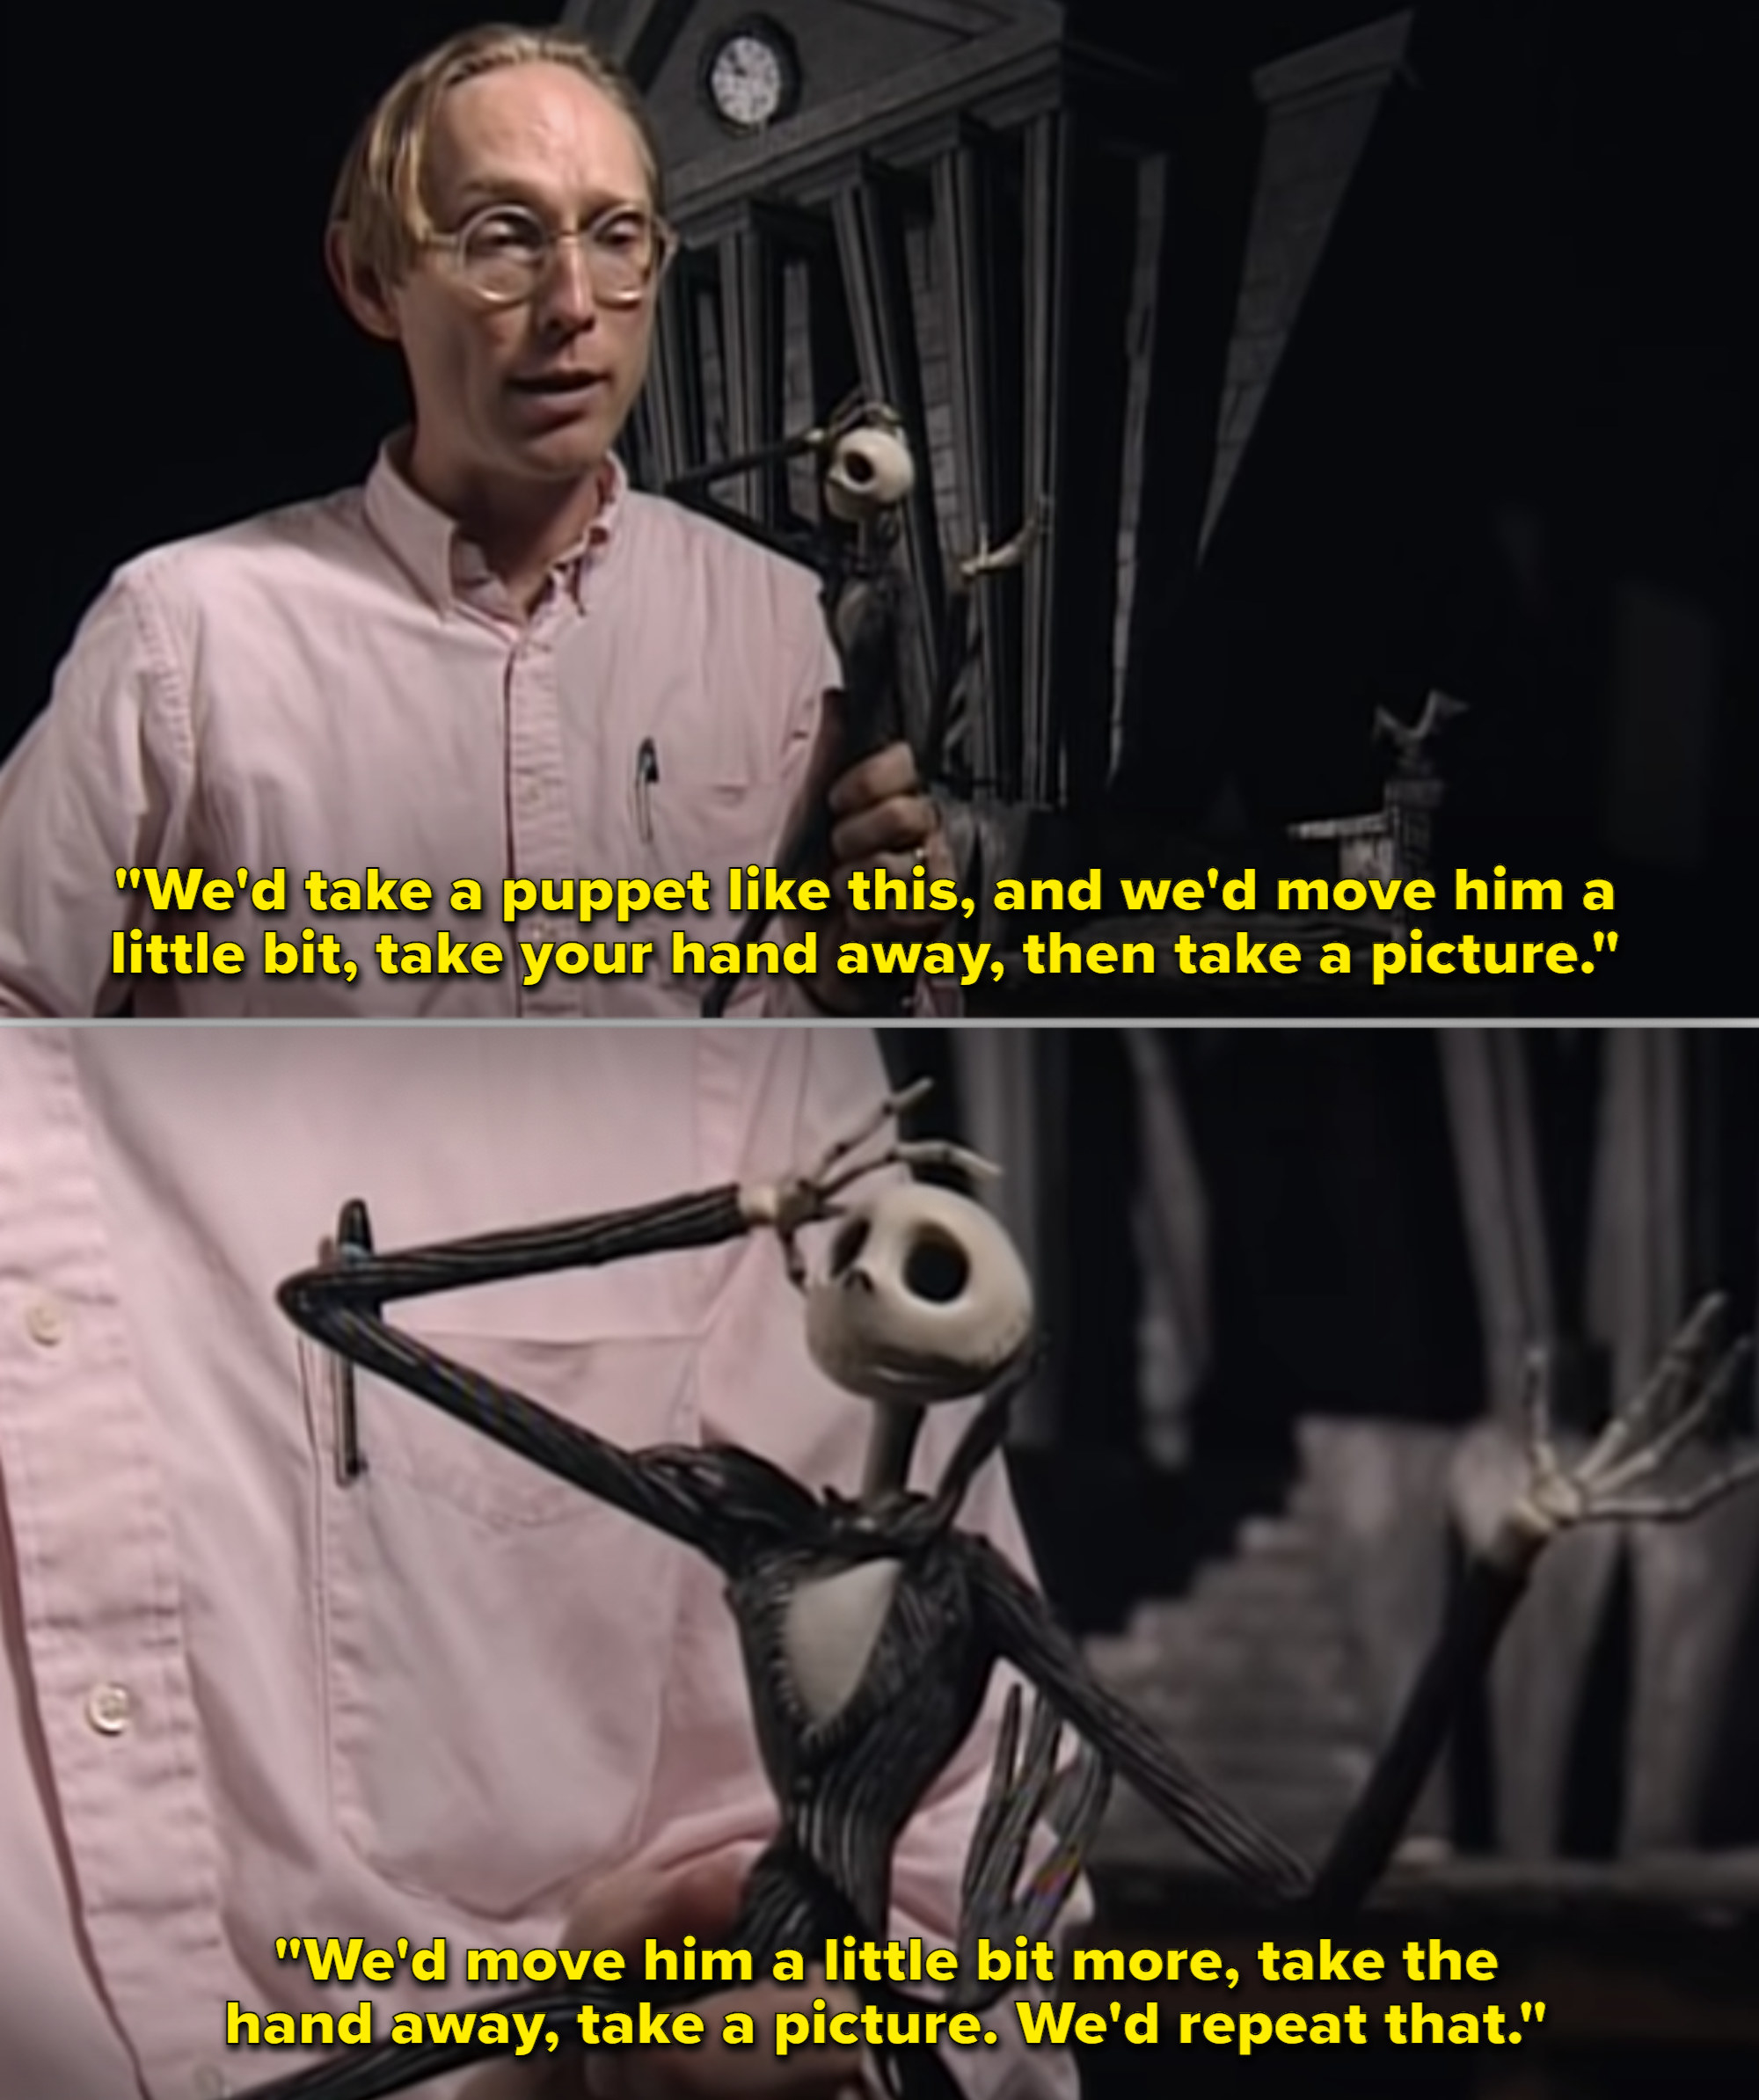 Someone on set holding the Jack Skellington puppet